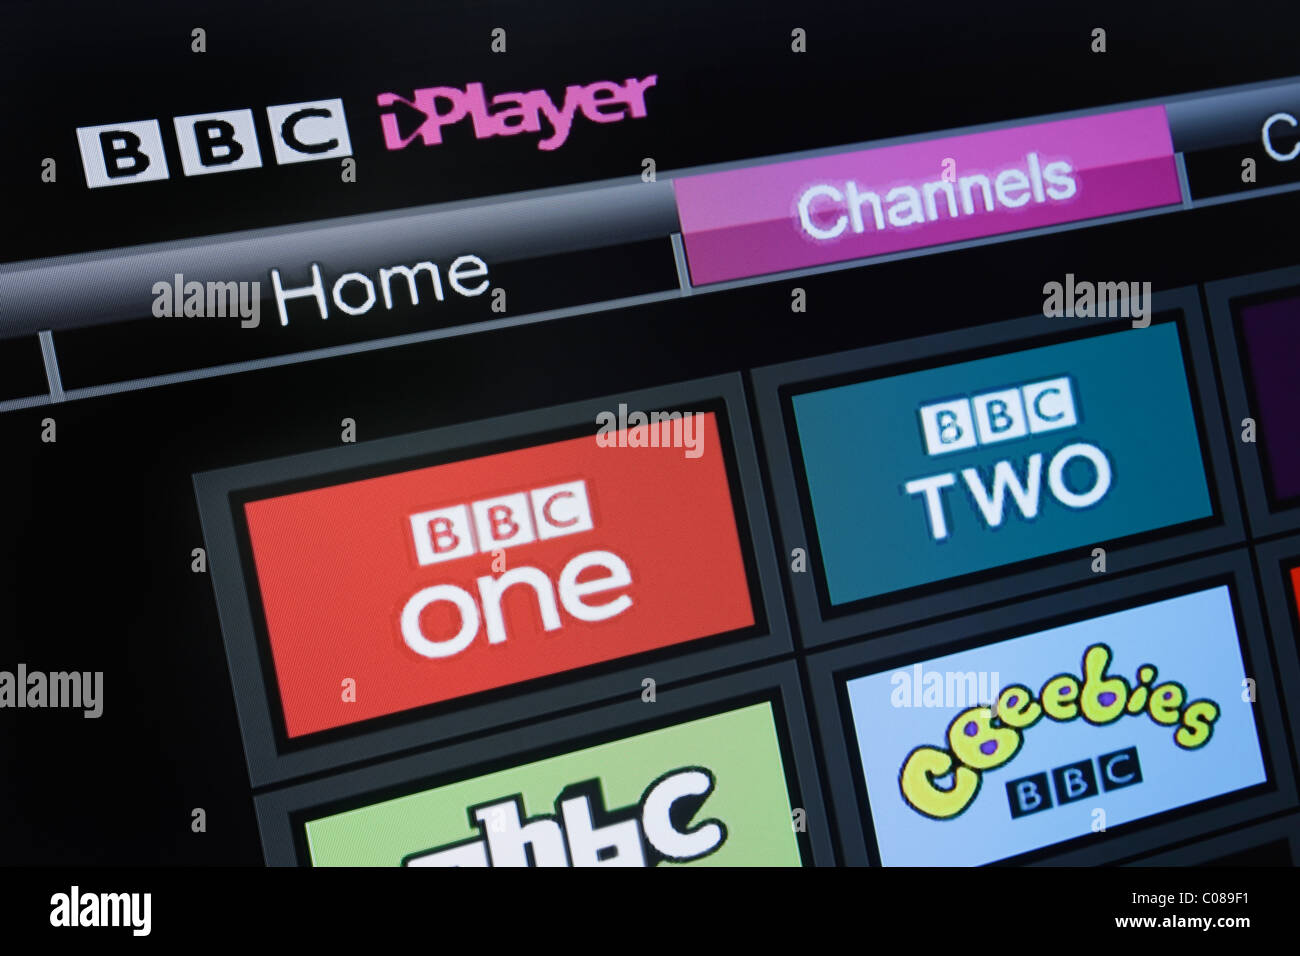 UK, Europe. Close-up screenshot of a flatscreen television showing BBC iPlayer channels on Freesat screen - Stock Image